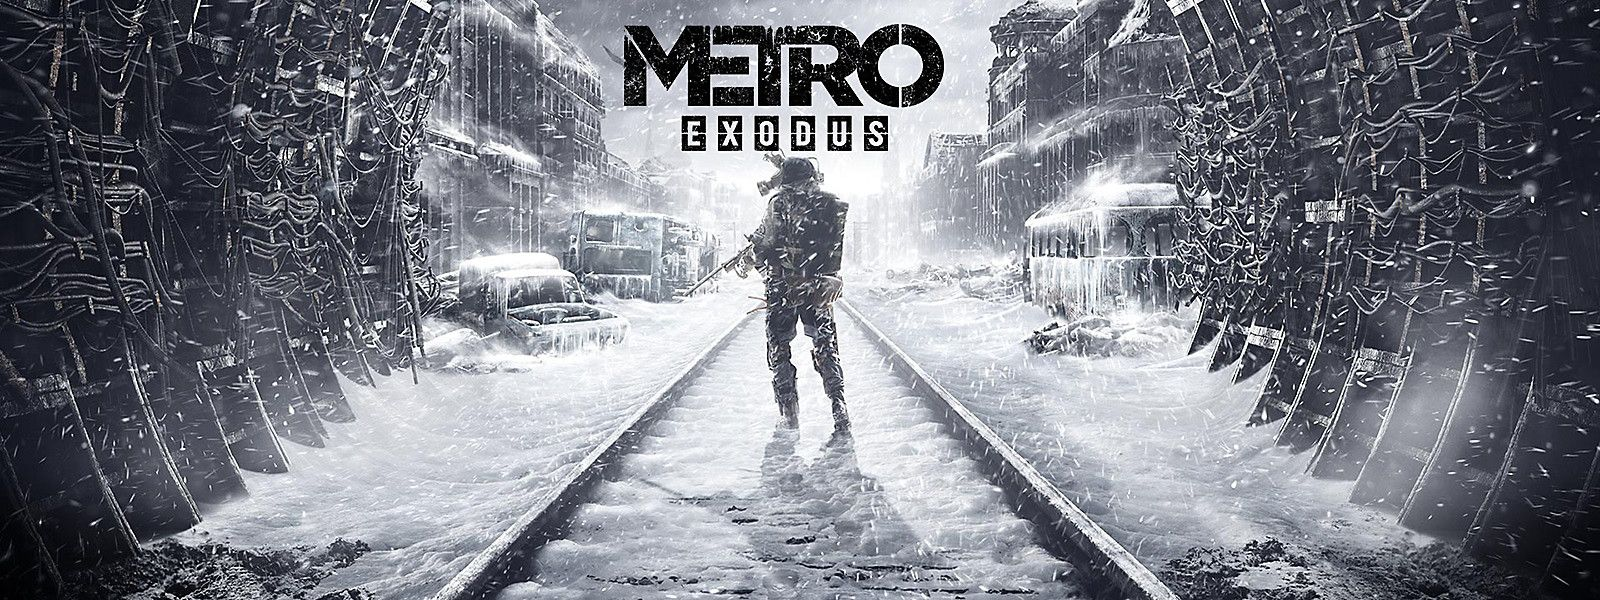 Free Download Metro Exodus 4k Wallpapers Tehnologii Postapokalipsis Apokalipsis